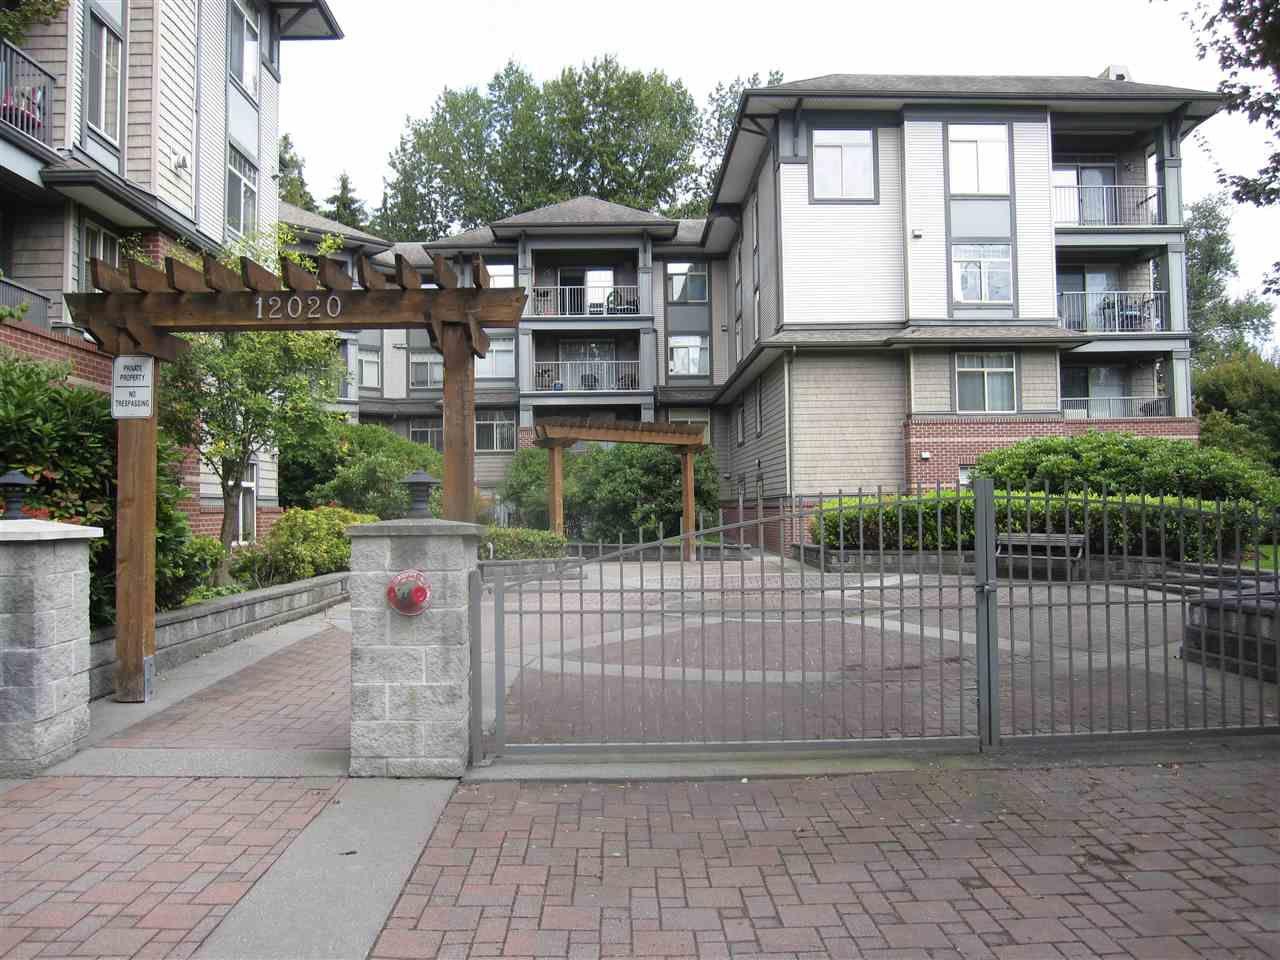 Main Photo: 306 12020 207A Street in Maple Ridge: Northwest Maple Ridge Condo for sale : MLS®# R2518444